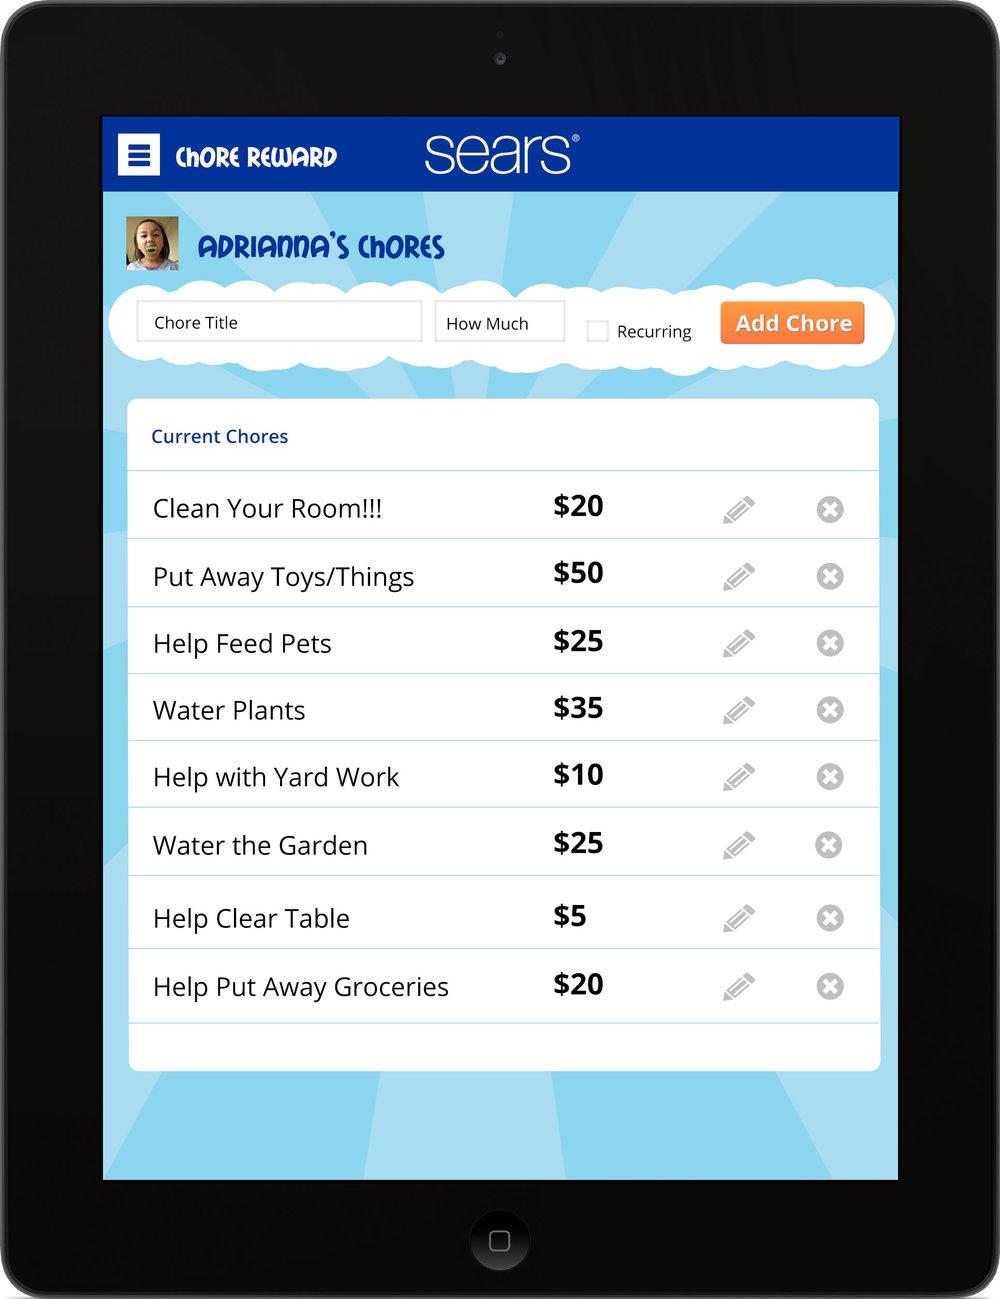 chore_reward_app_3.jpg